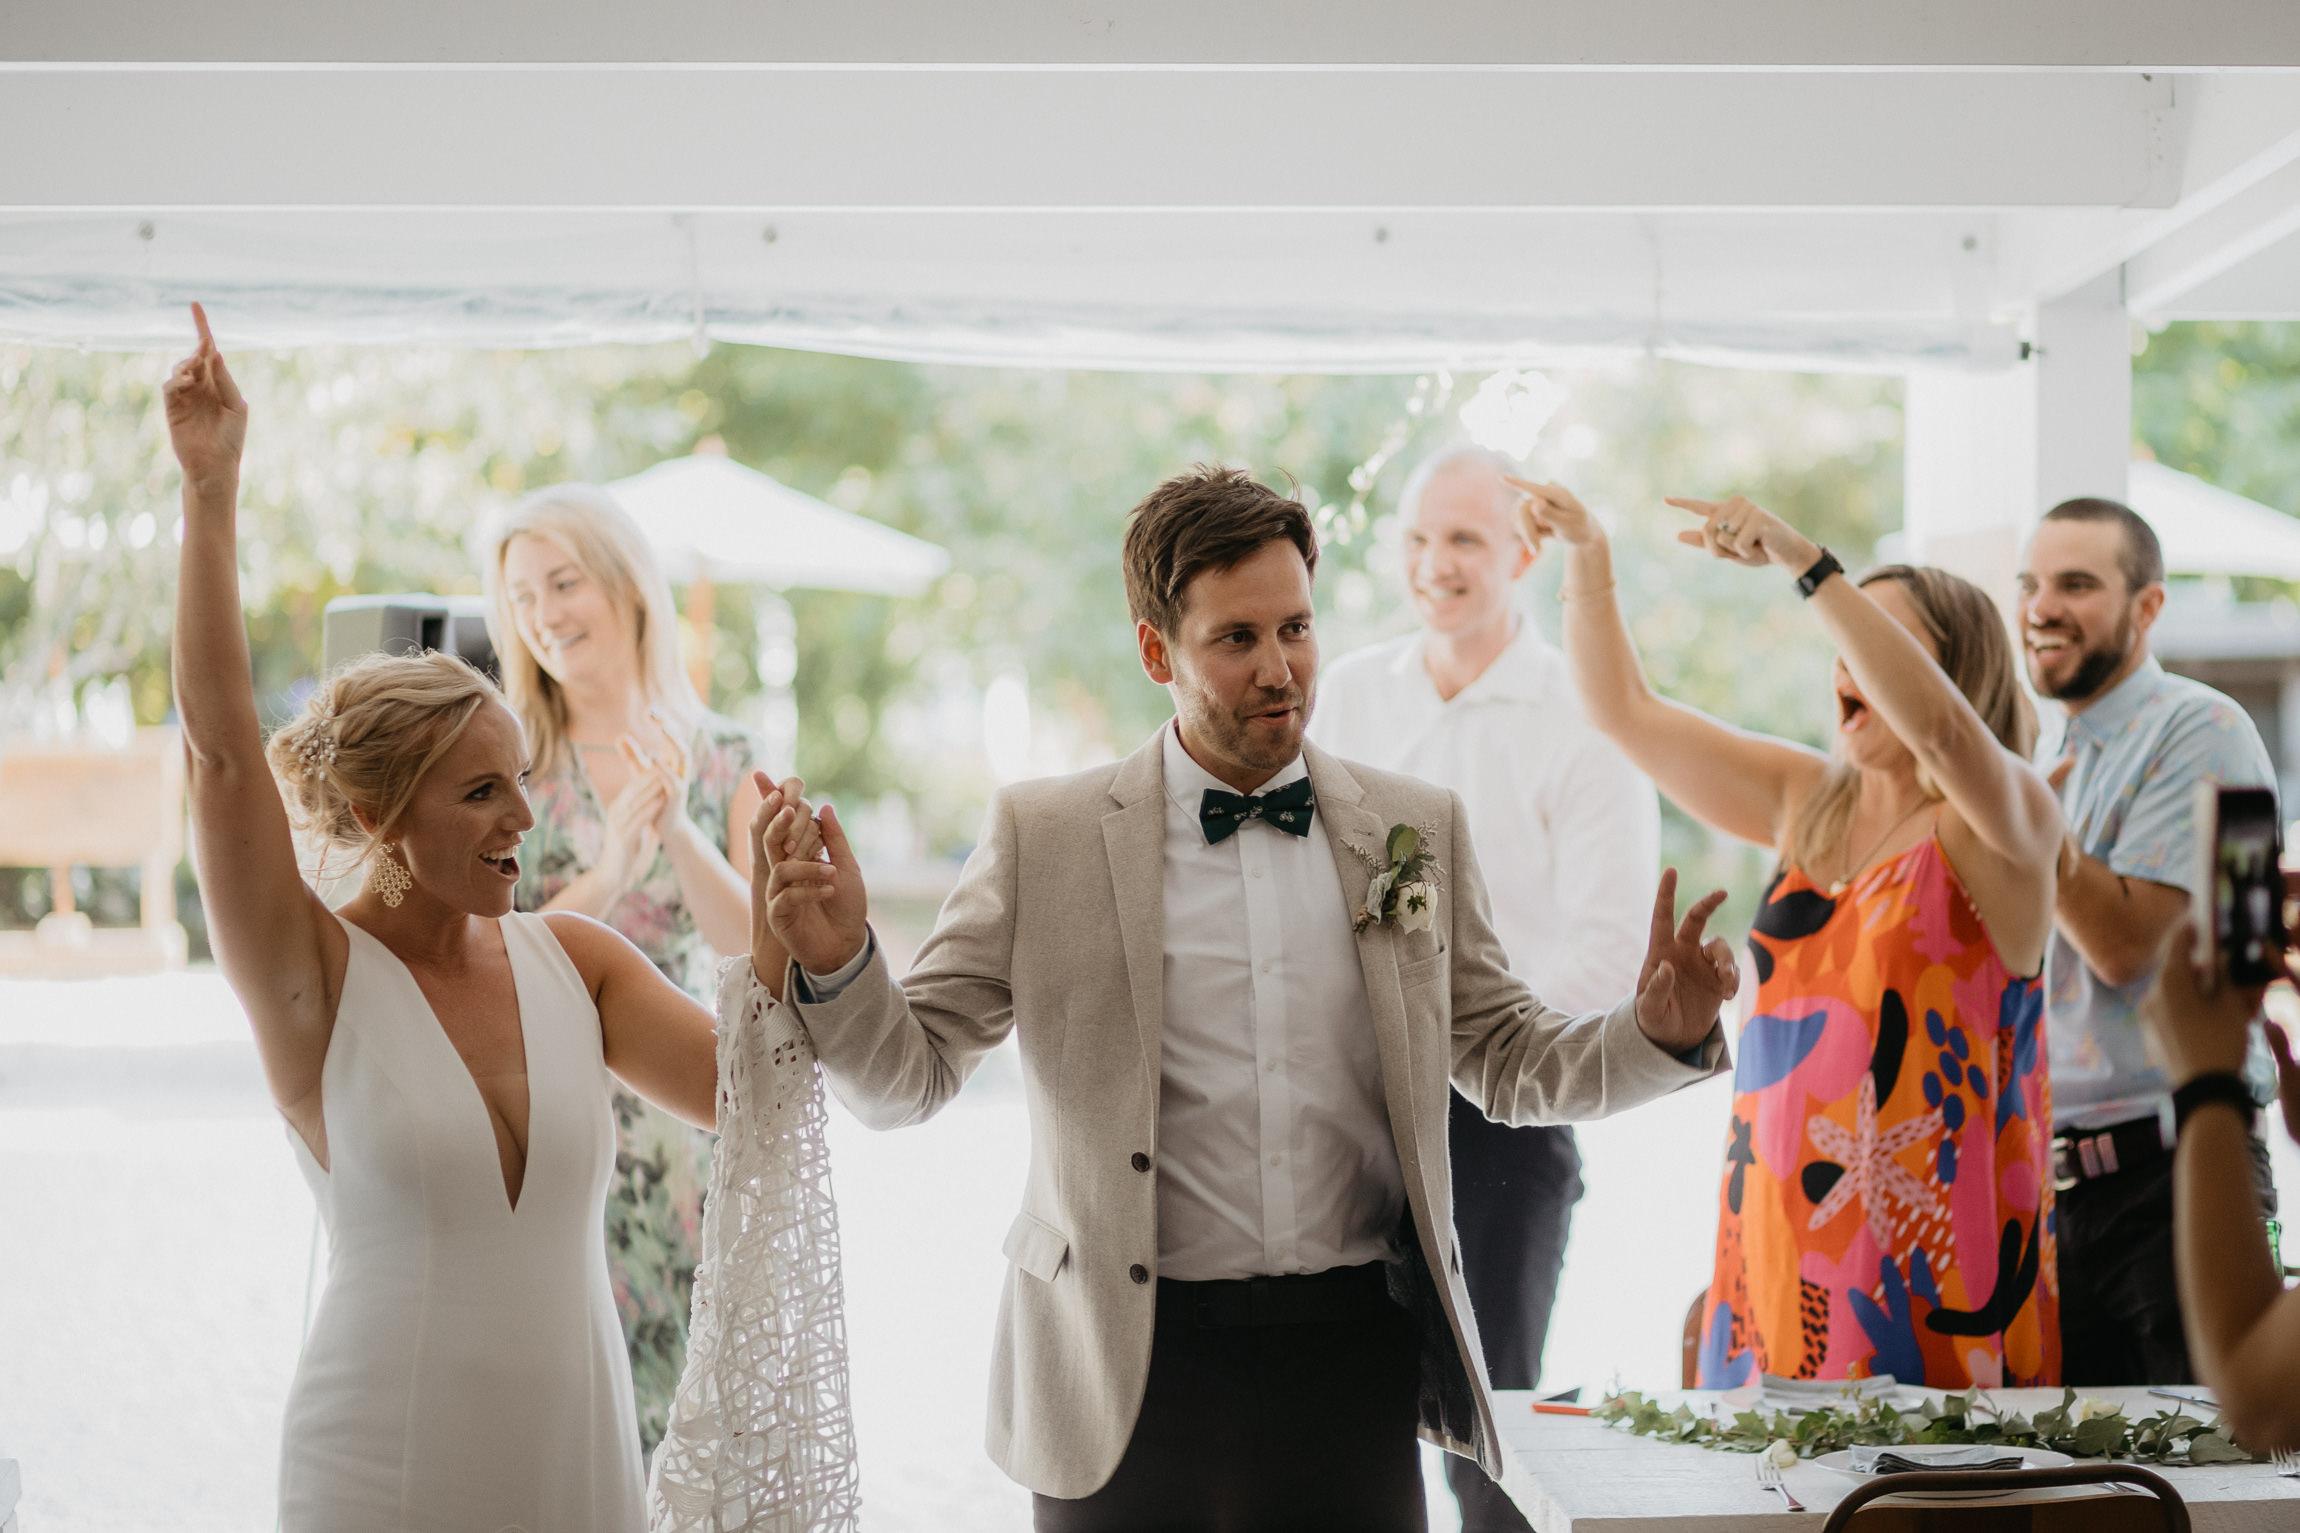 oldforestschool-wedding-blog-145.jpg